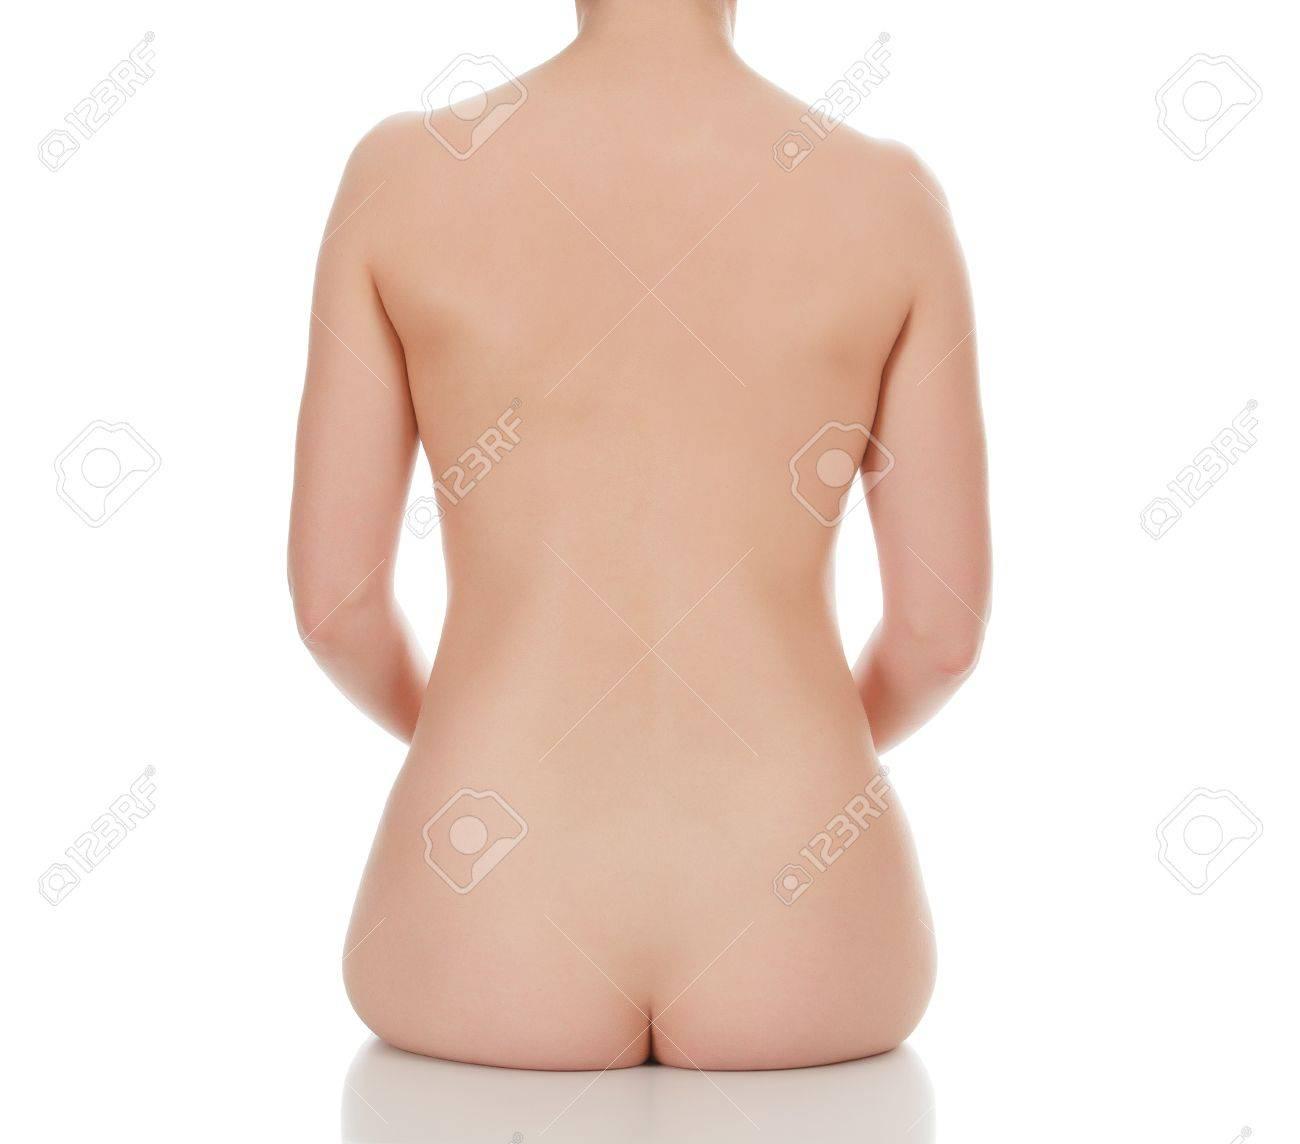 melissa garcia naked